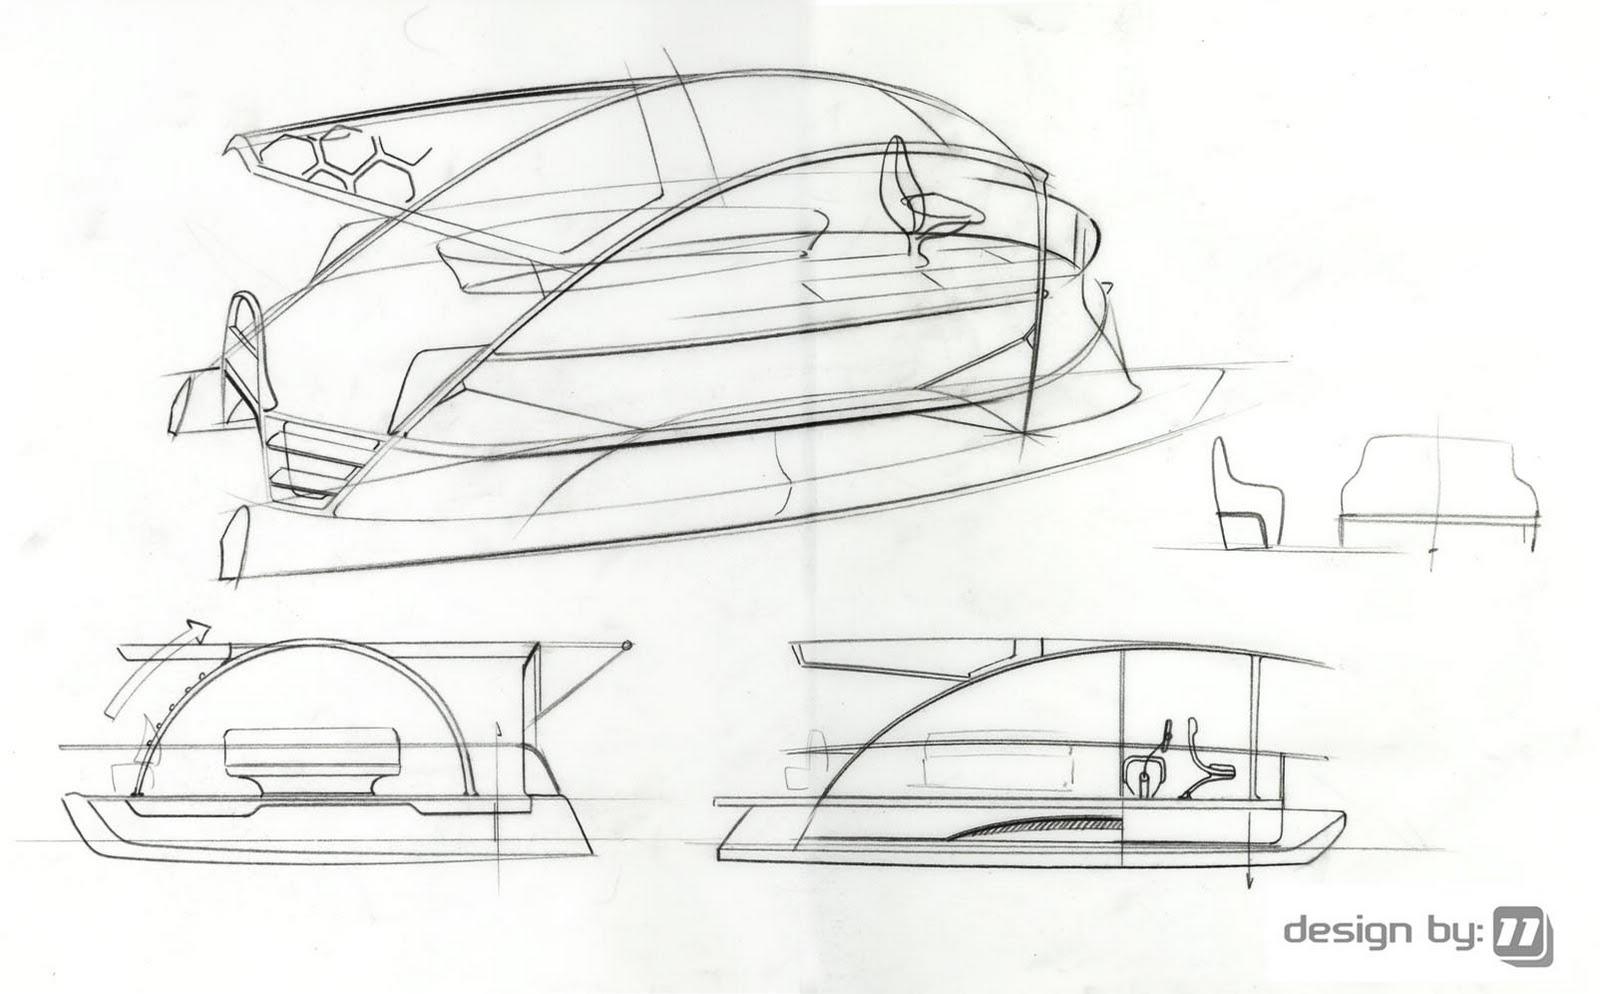 hight resolution of 1600x994 designby11 solar electric pontoon boat design pontoon boat sketch